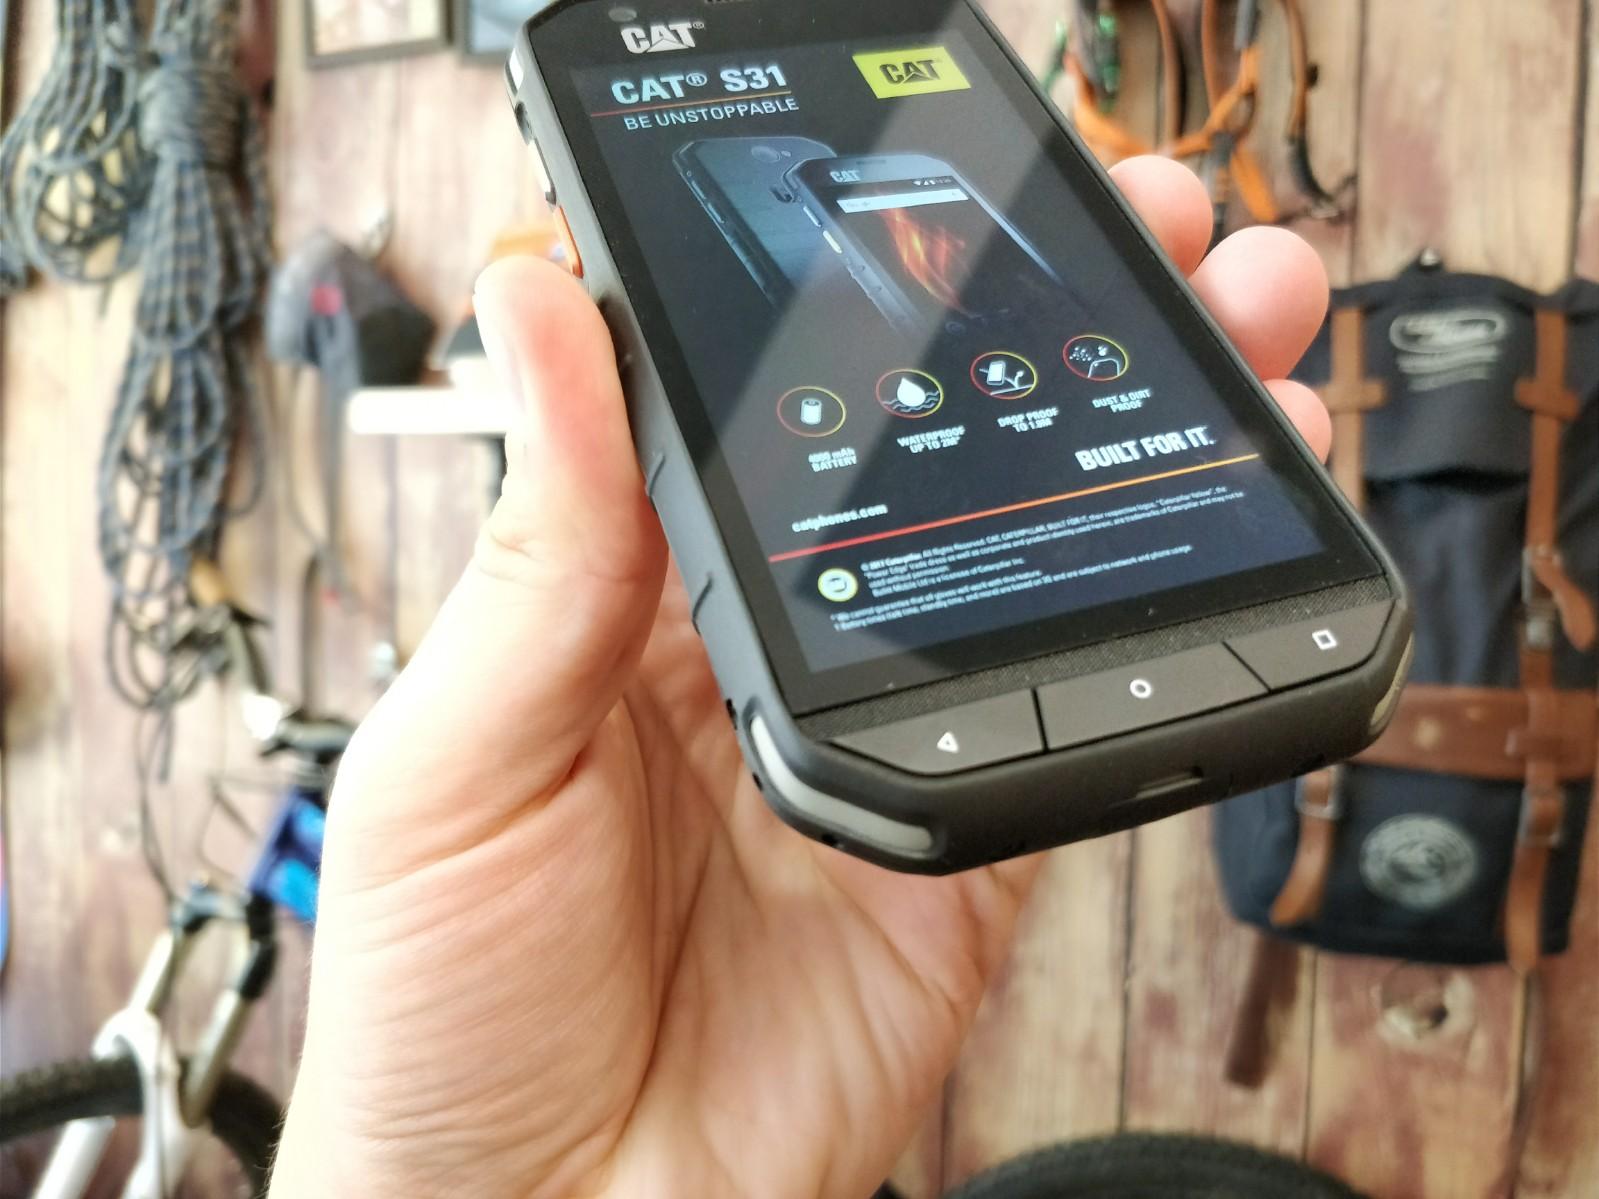 smartfon CAT S31 wygląd